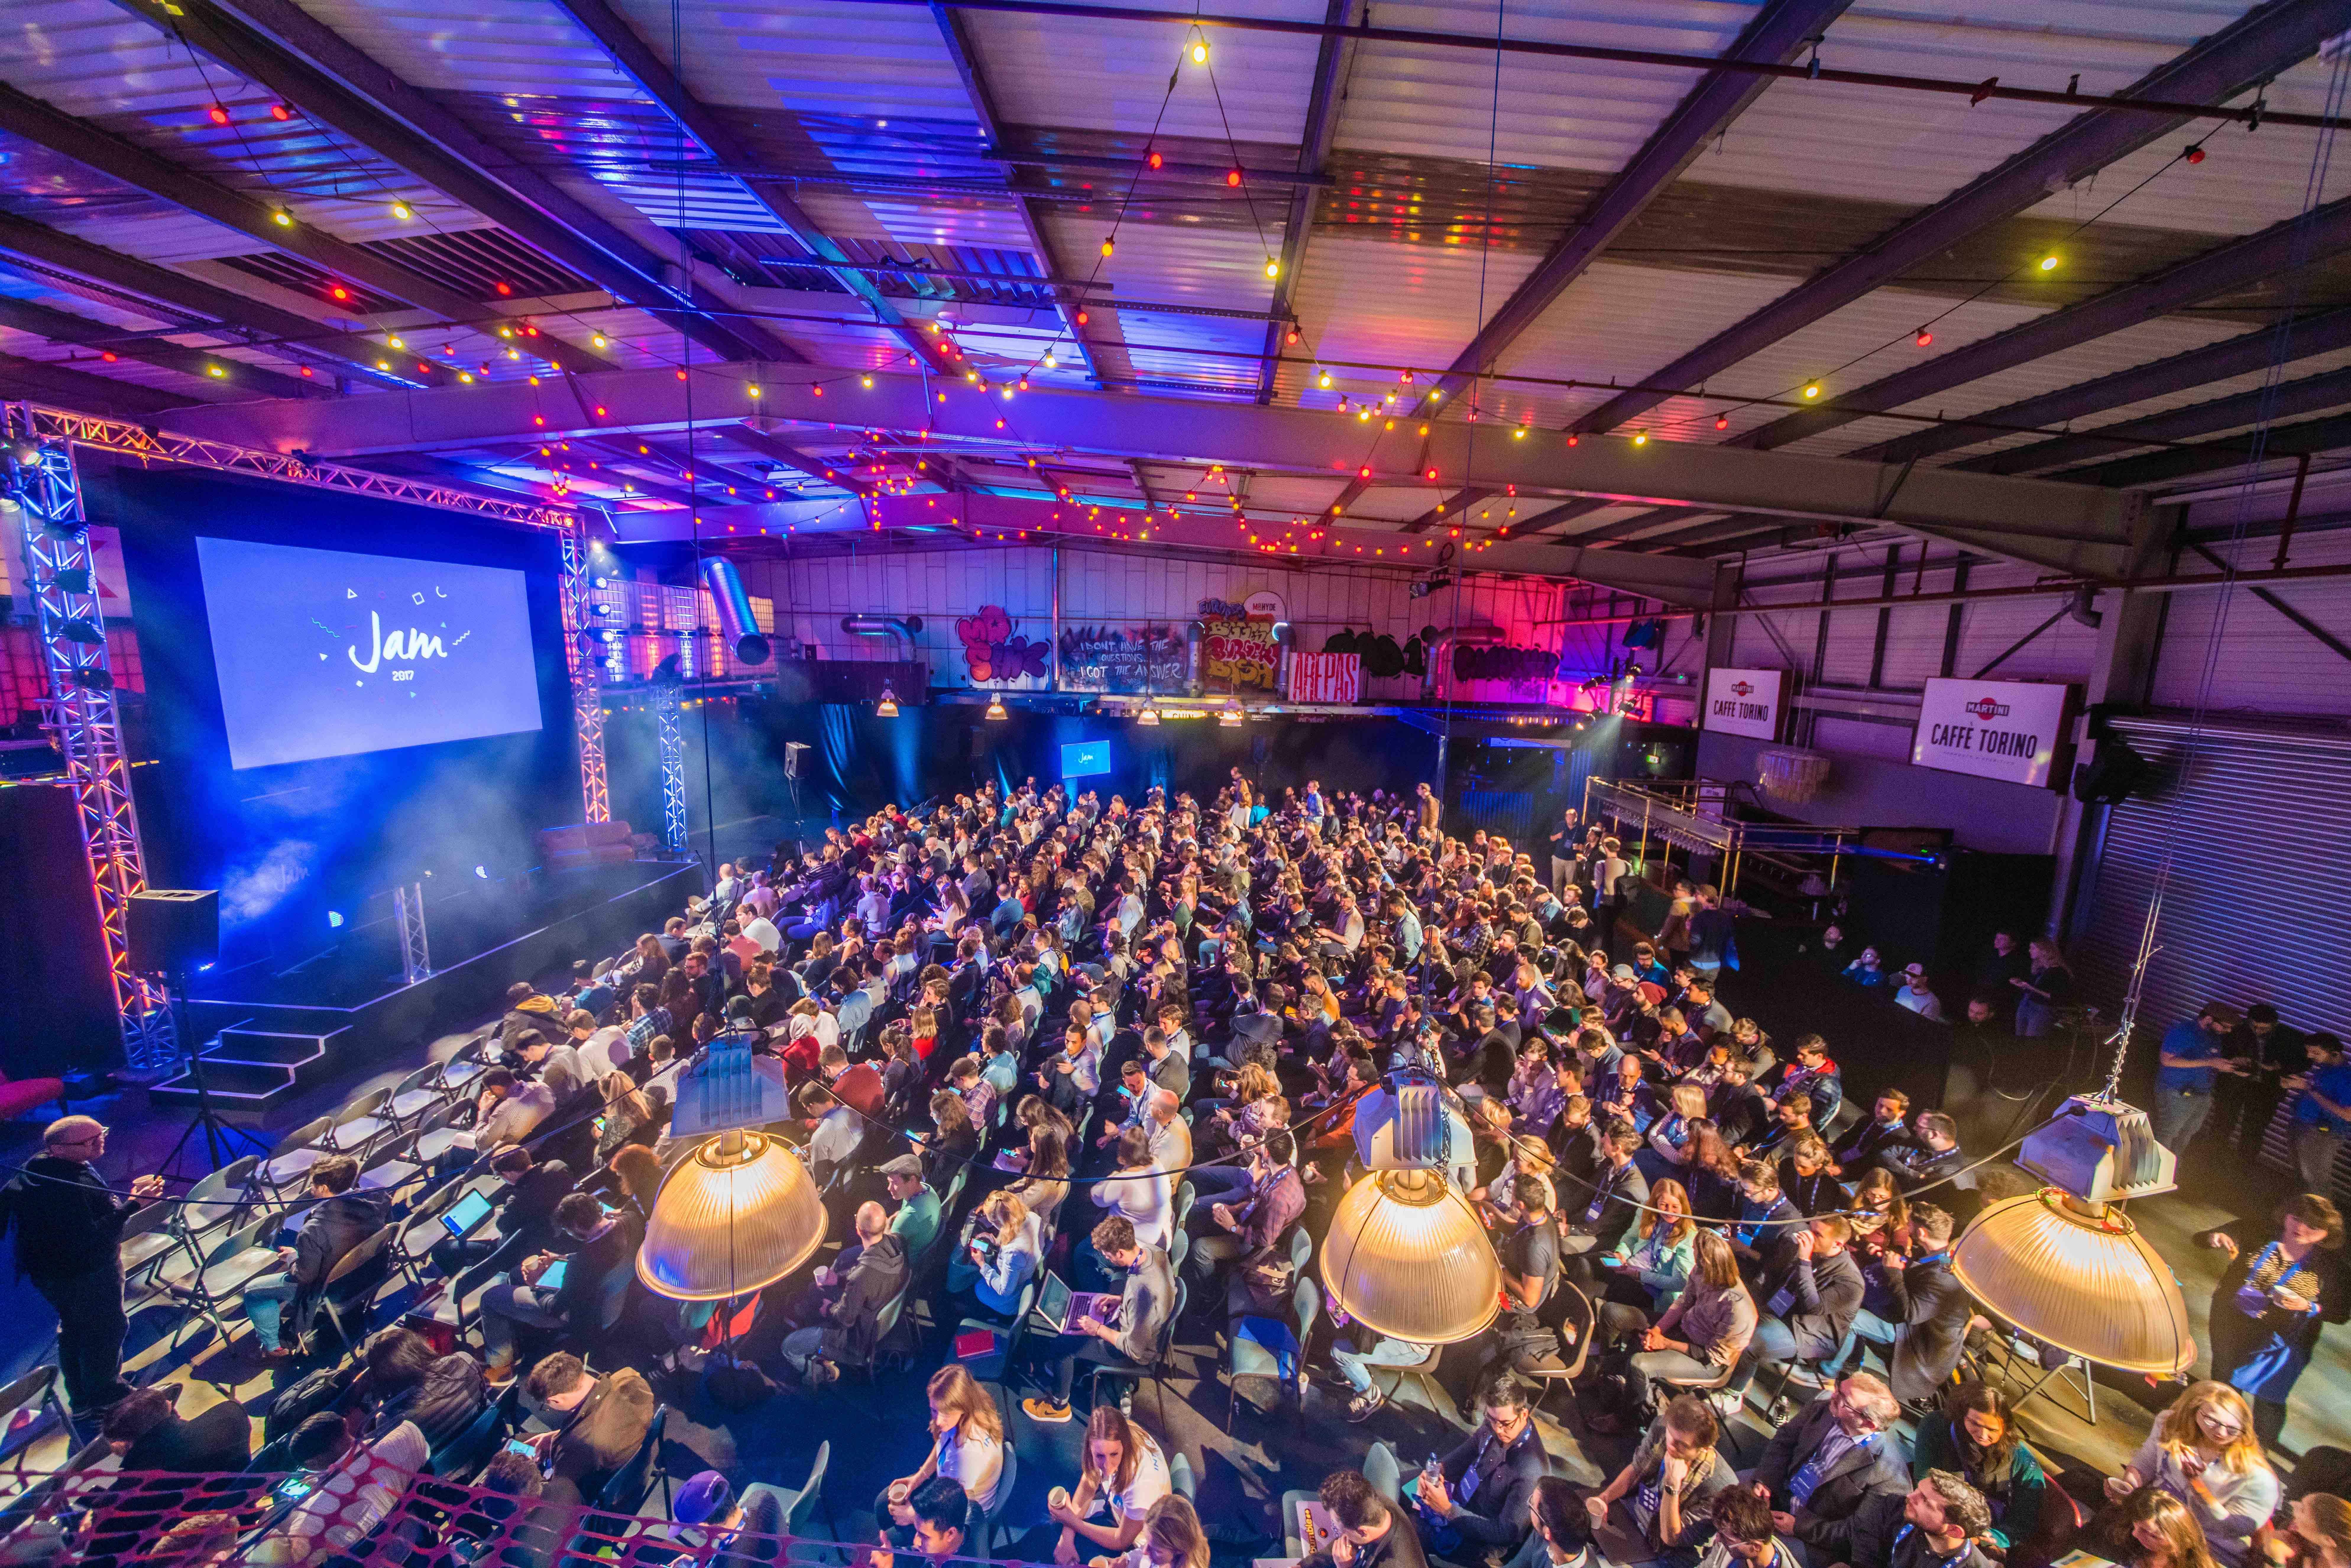 JAM design event, London